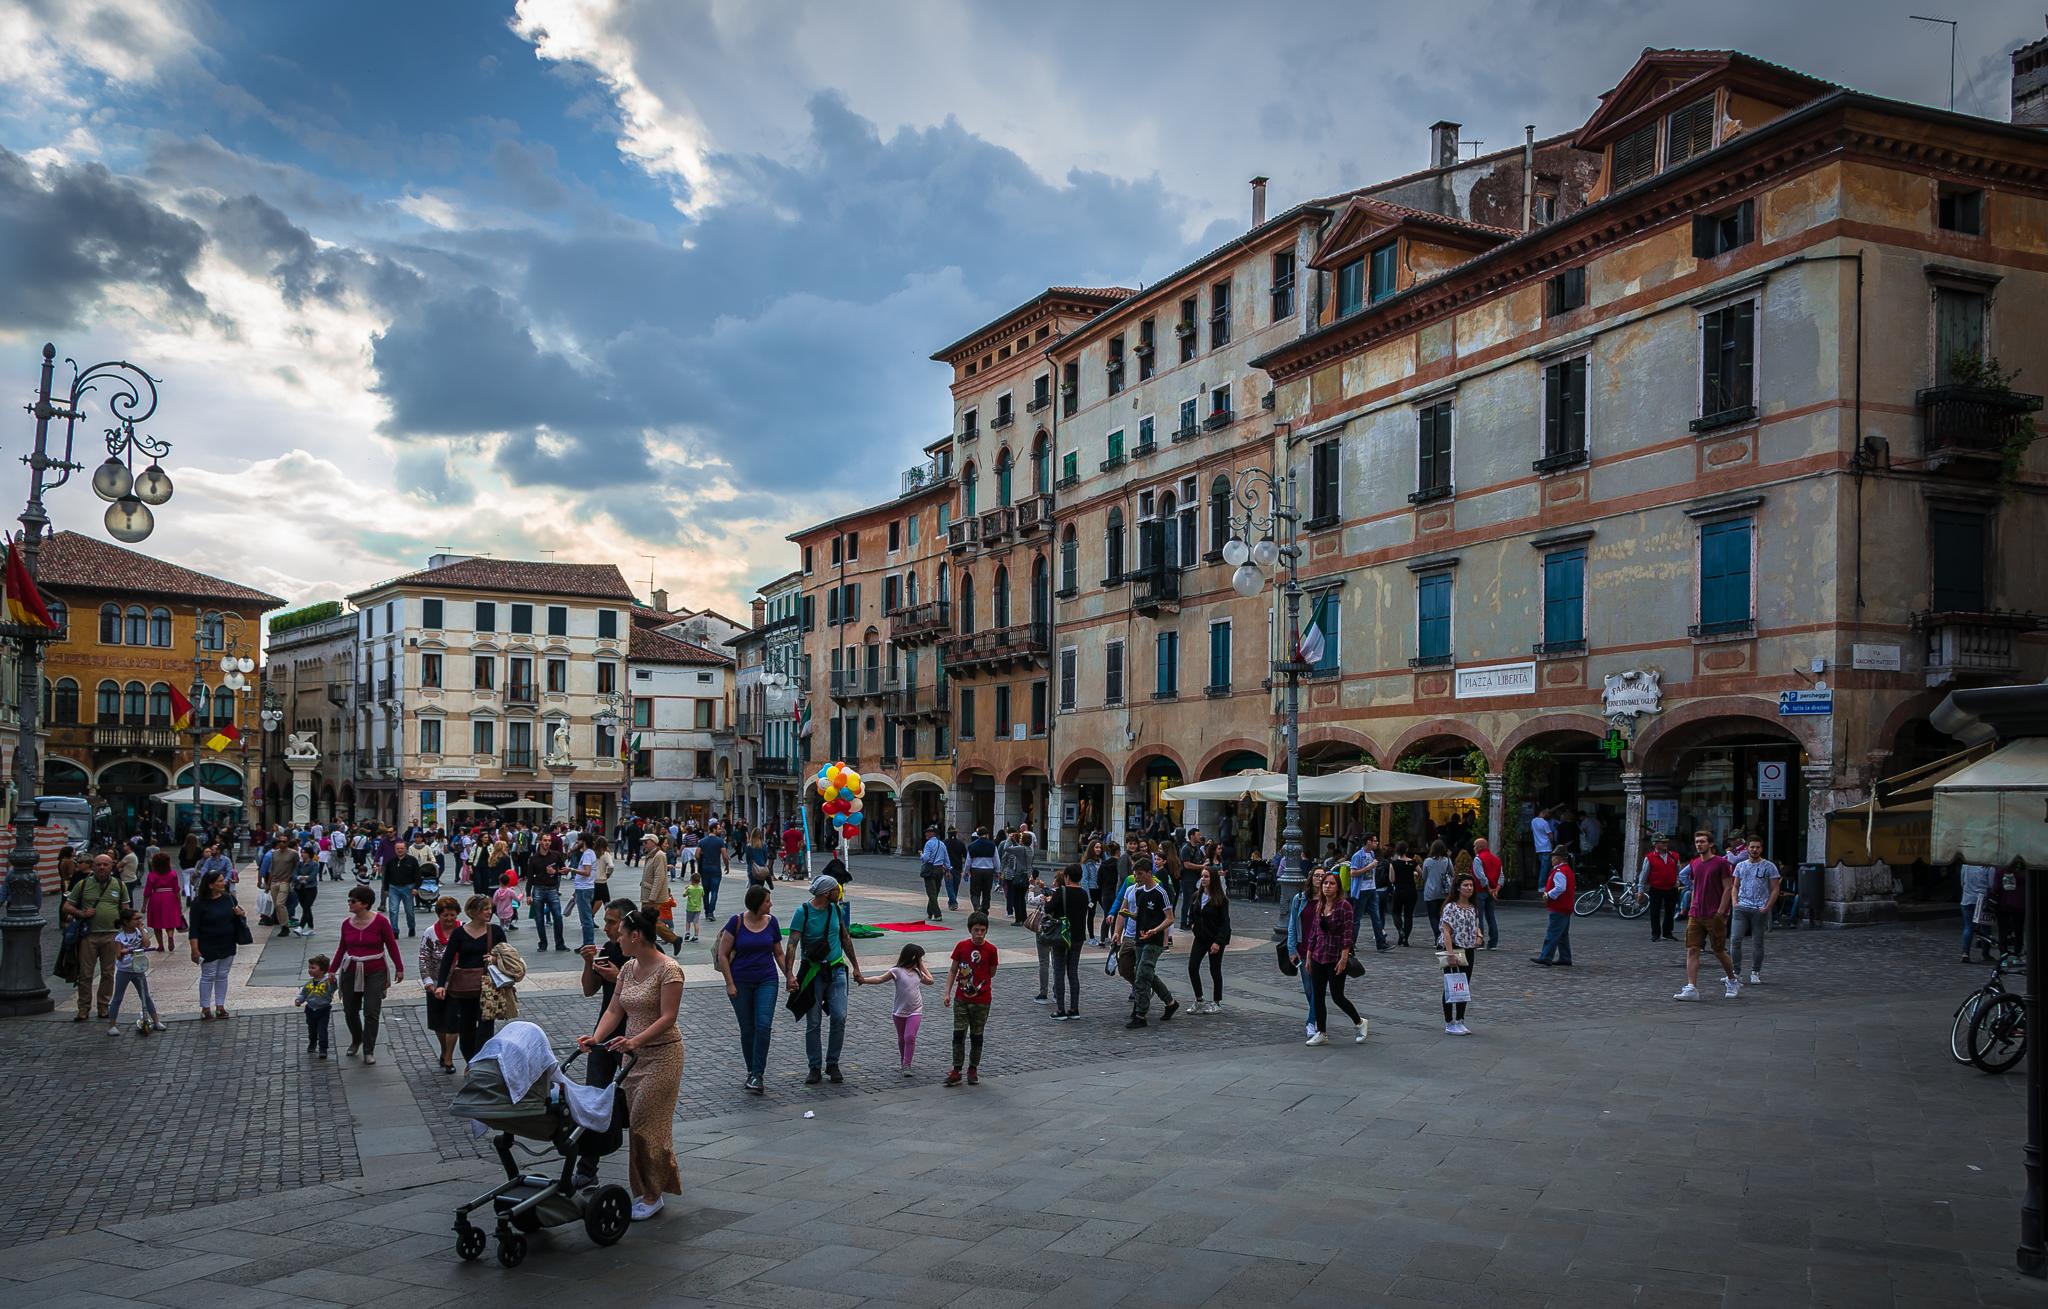 Piazza Libertà, Italy